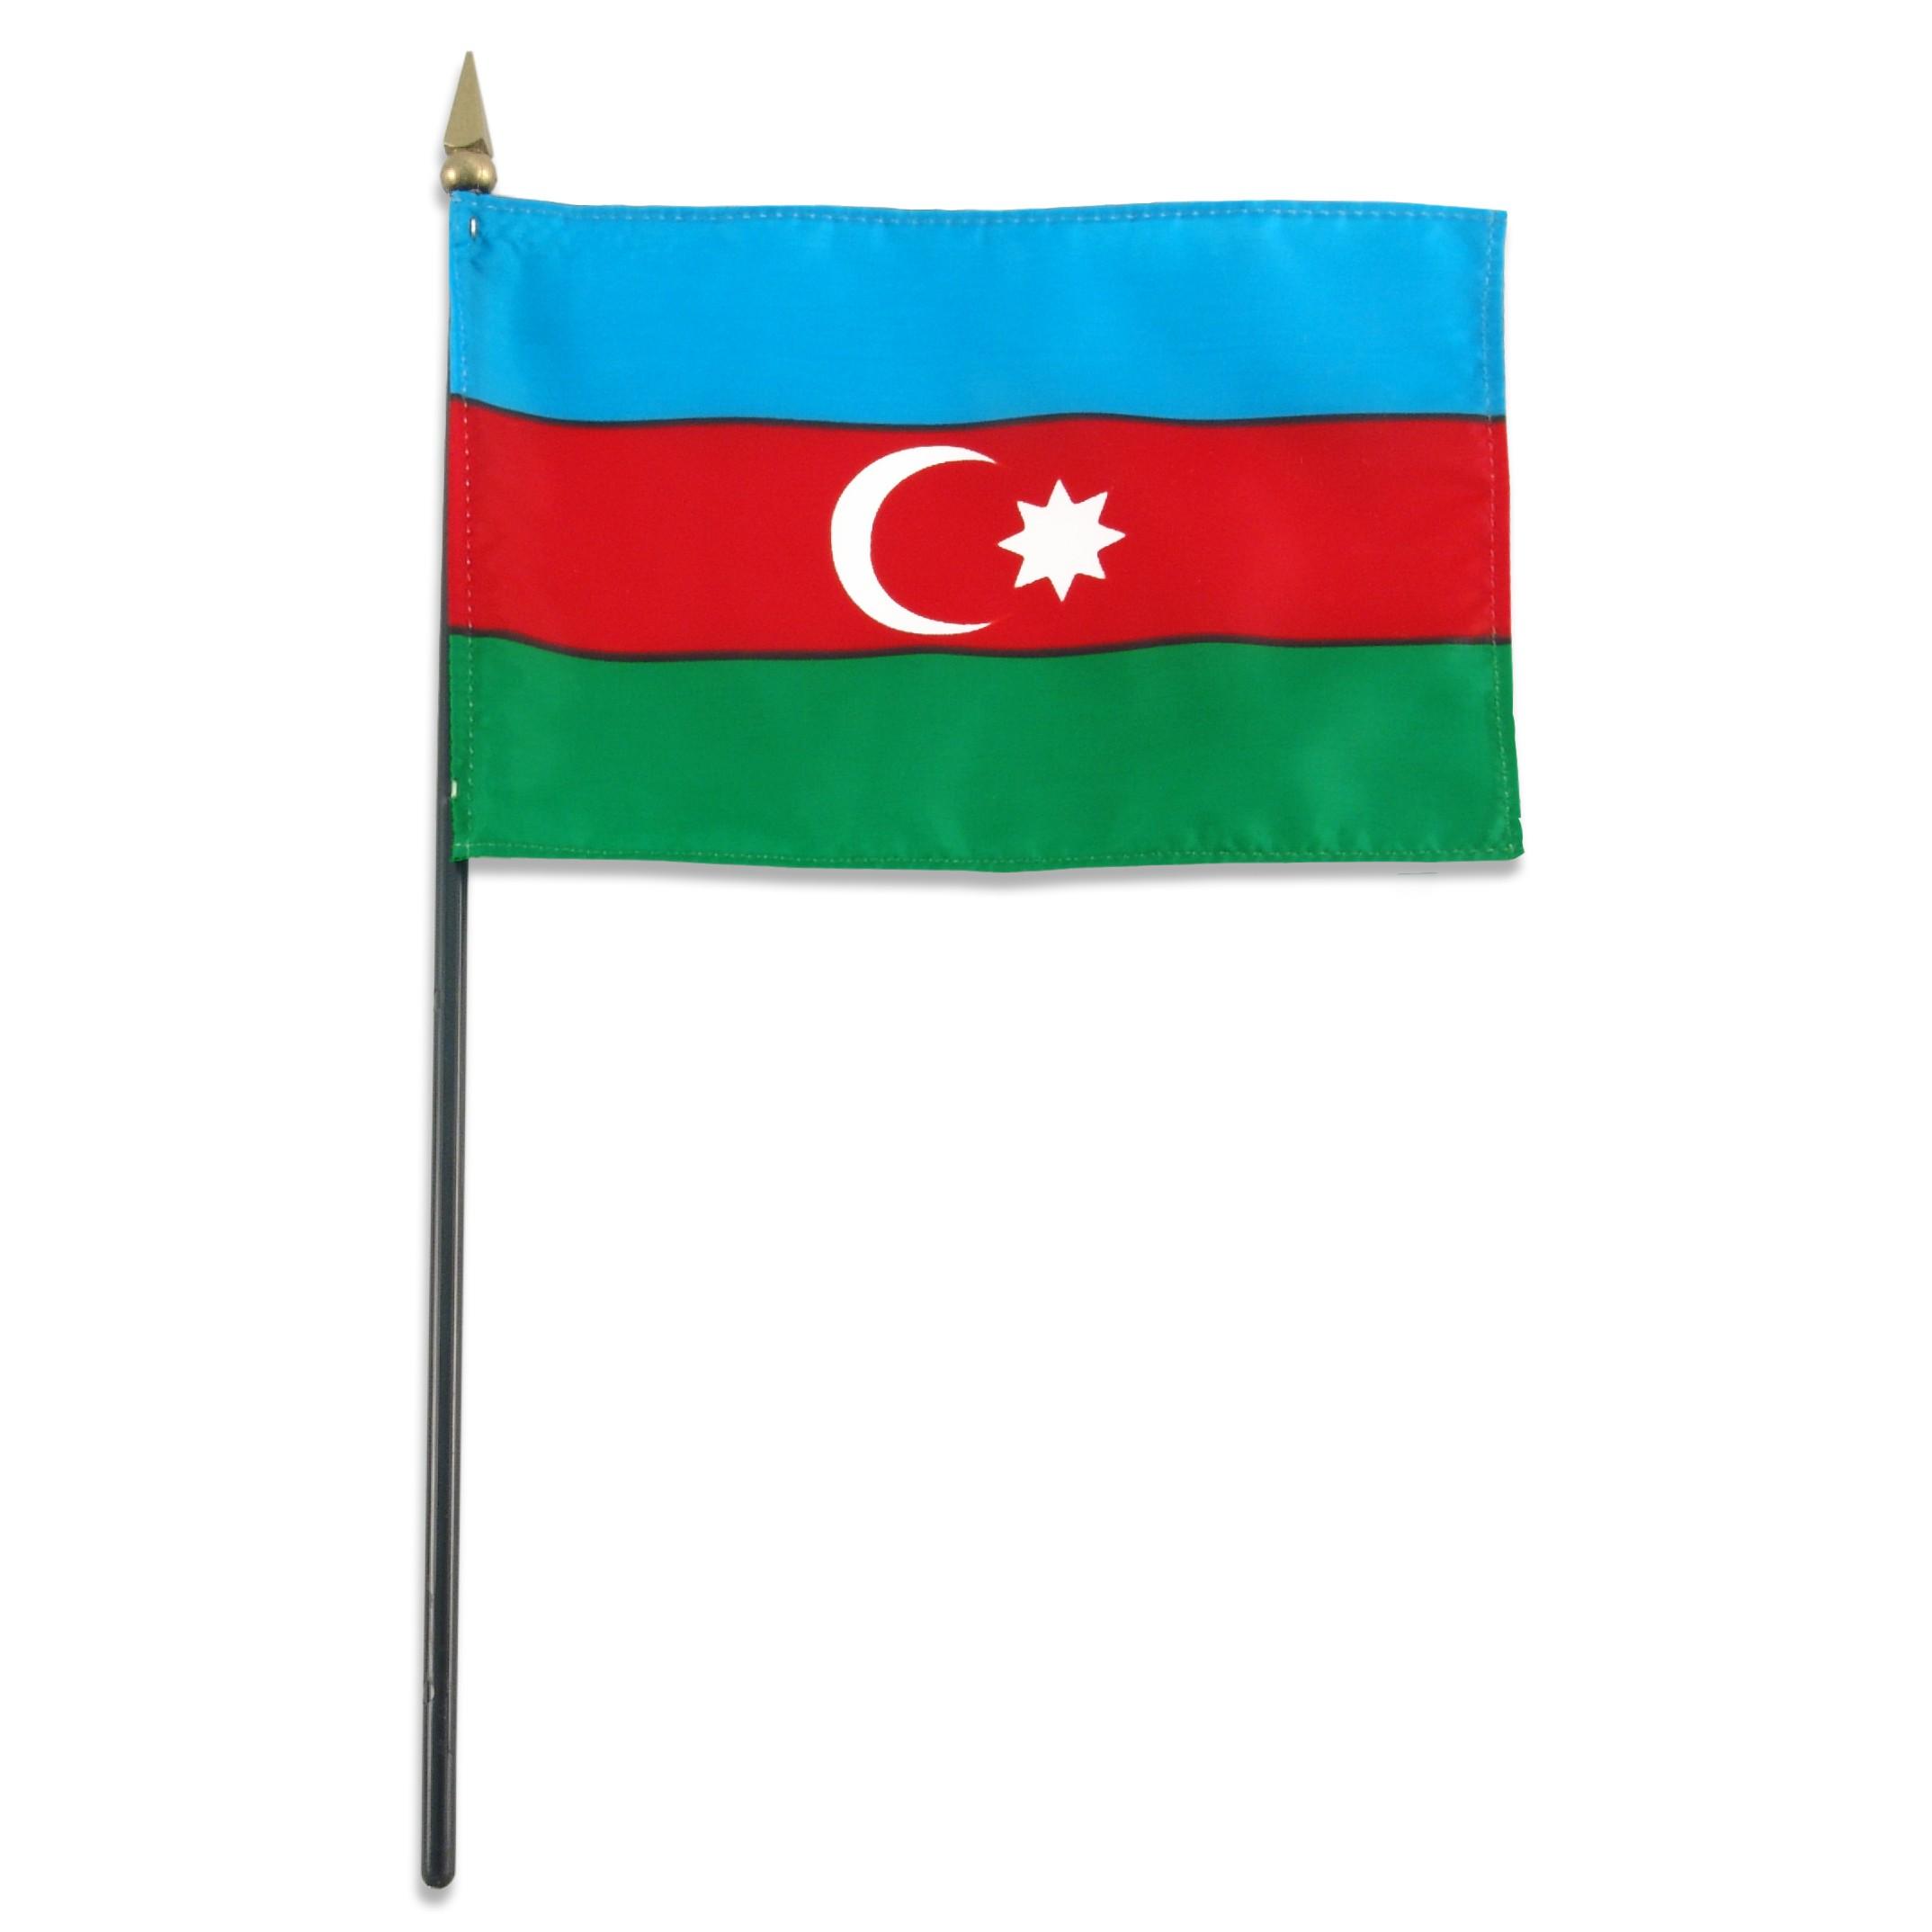 Flag Of Azerbaijan - The Symbol Of Islamic and Turkish Culture